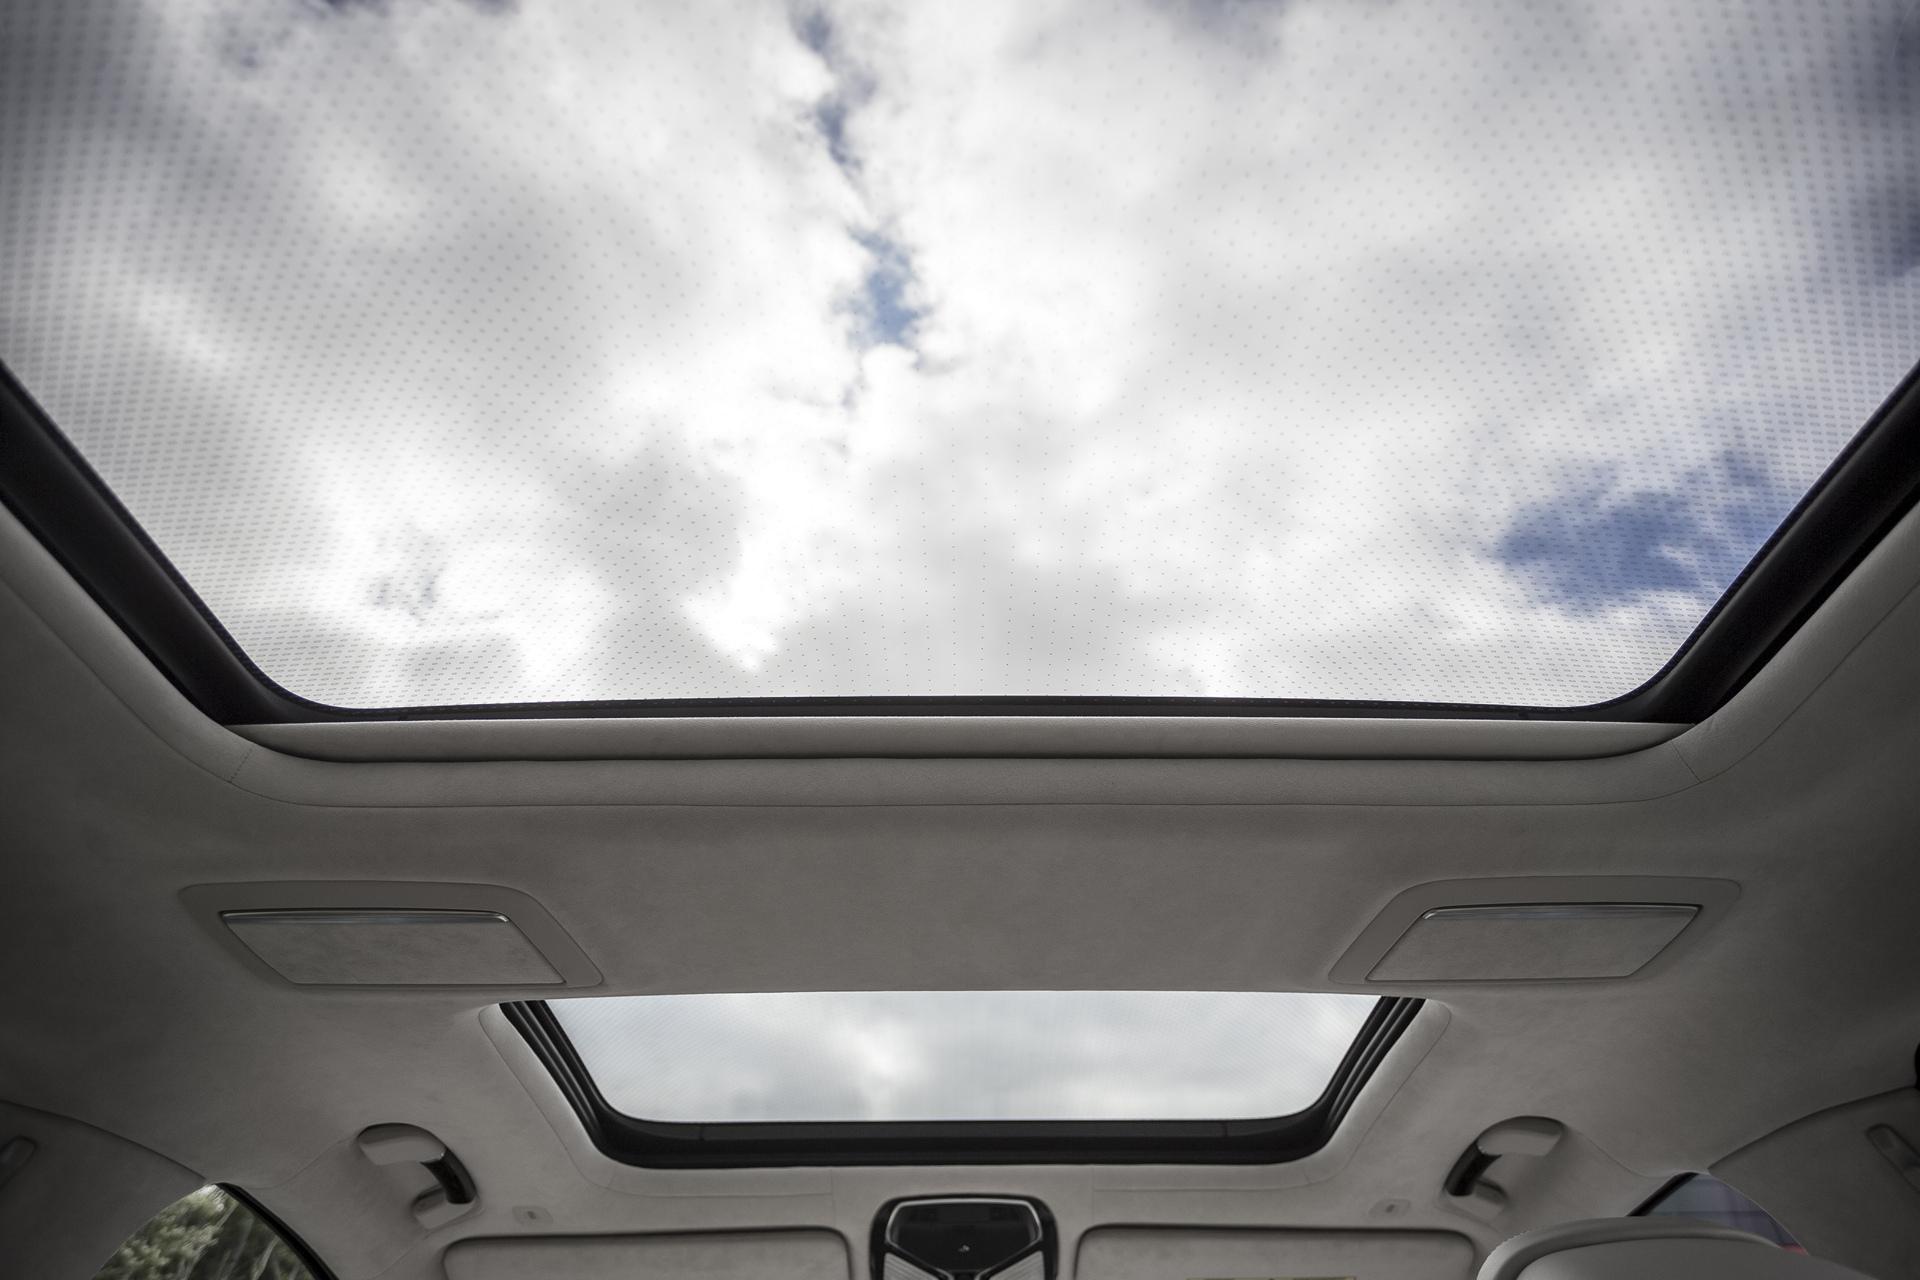 2016 Bmw 7 Series Review Carrrs Auto Portal